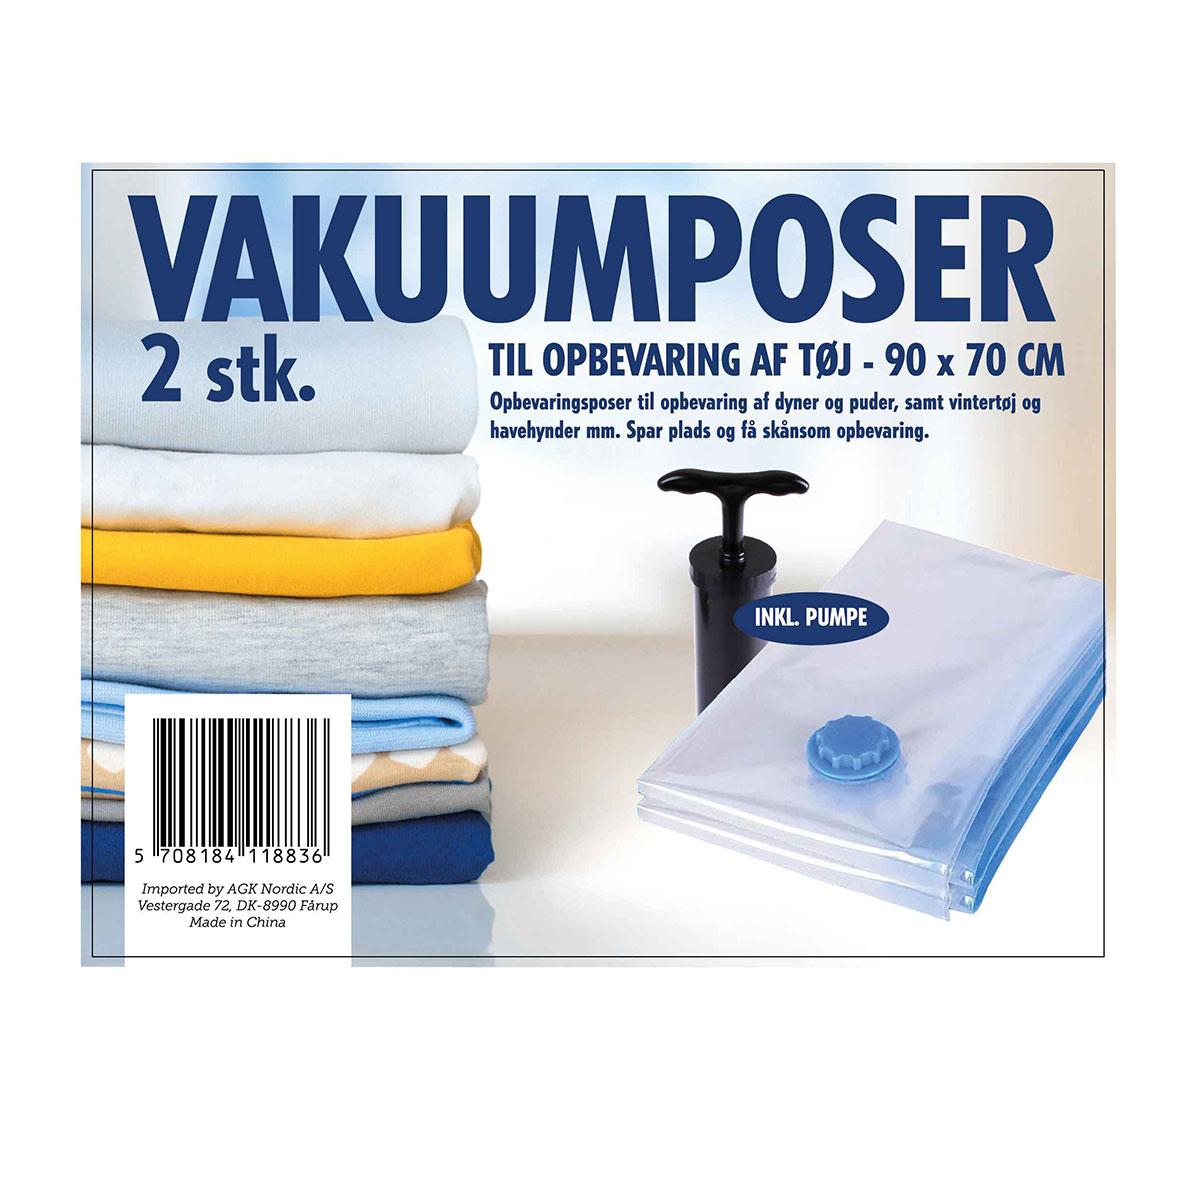 Picture of: Vakuumpose Til Toj M Pumpe 2 Stk Goshop Dk